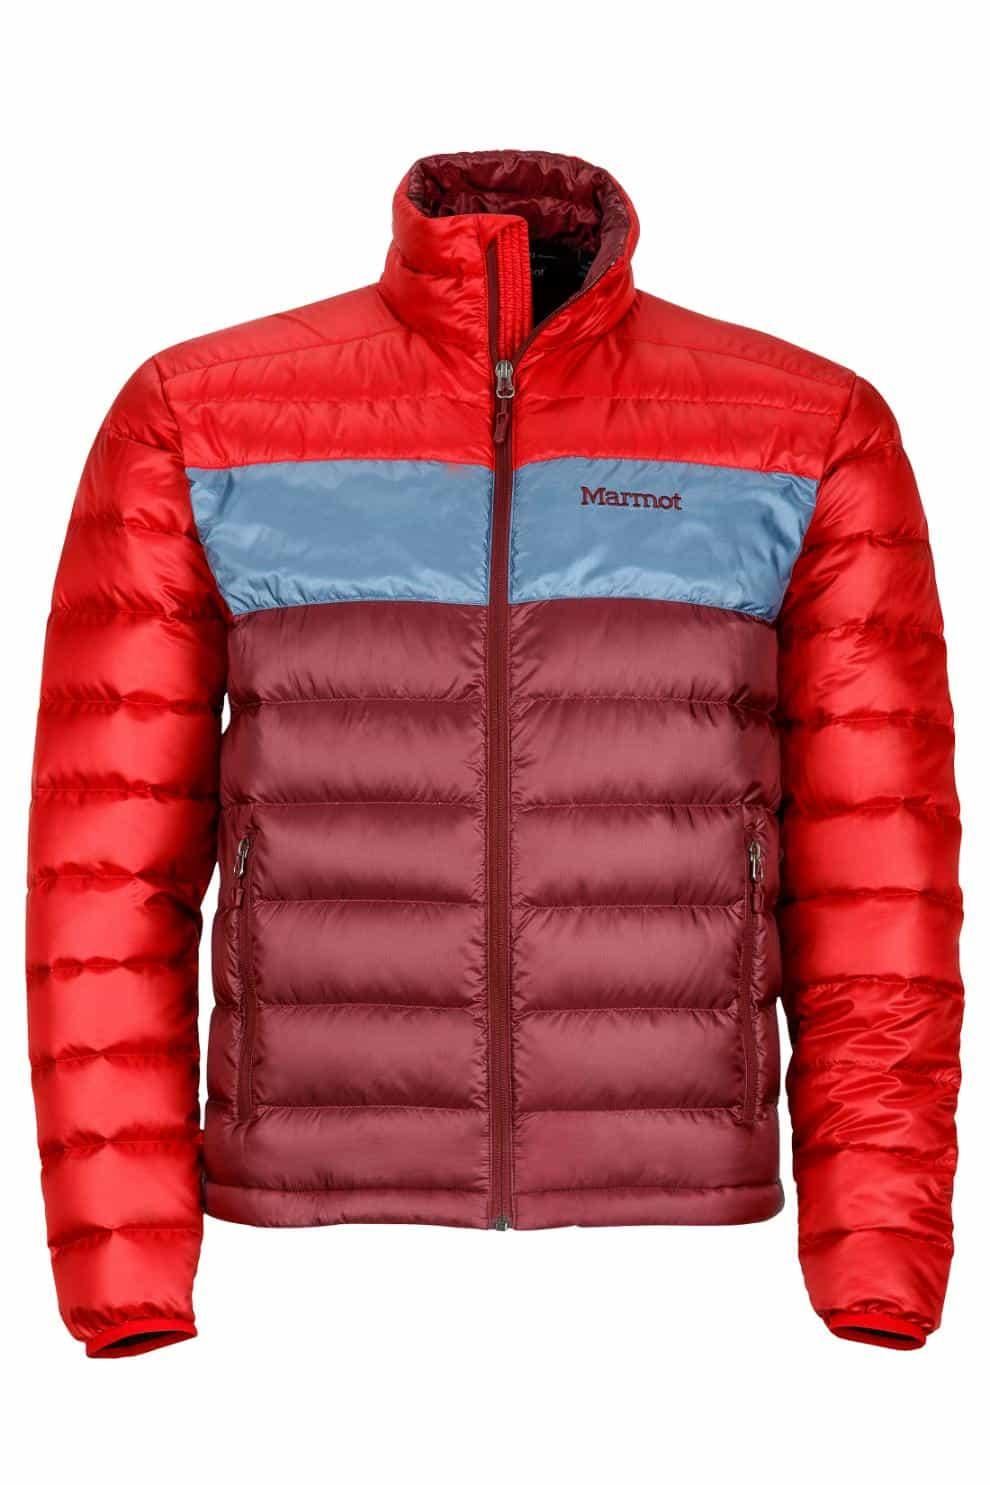 Marmot-Ares Jacket - Men's